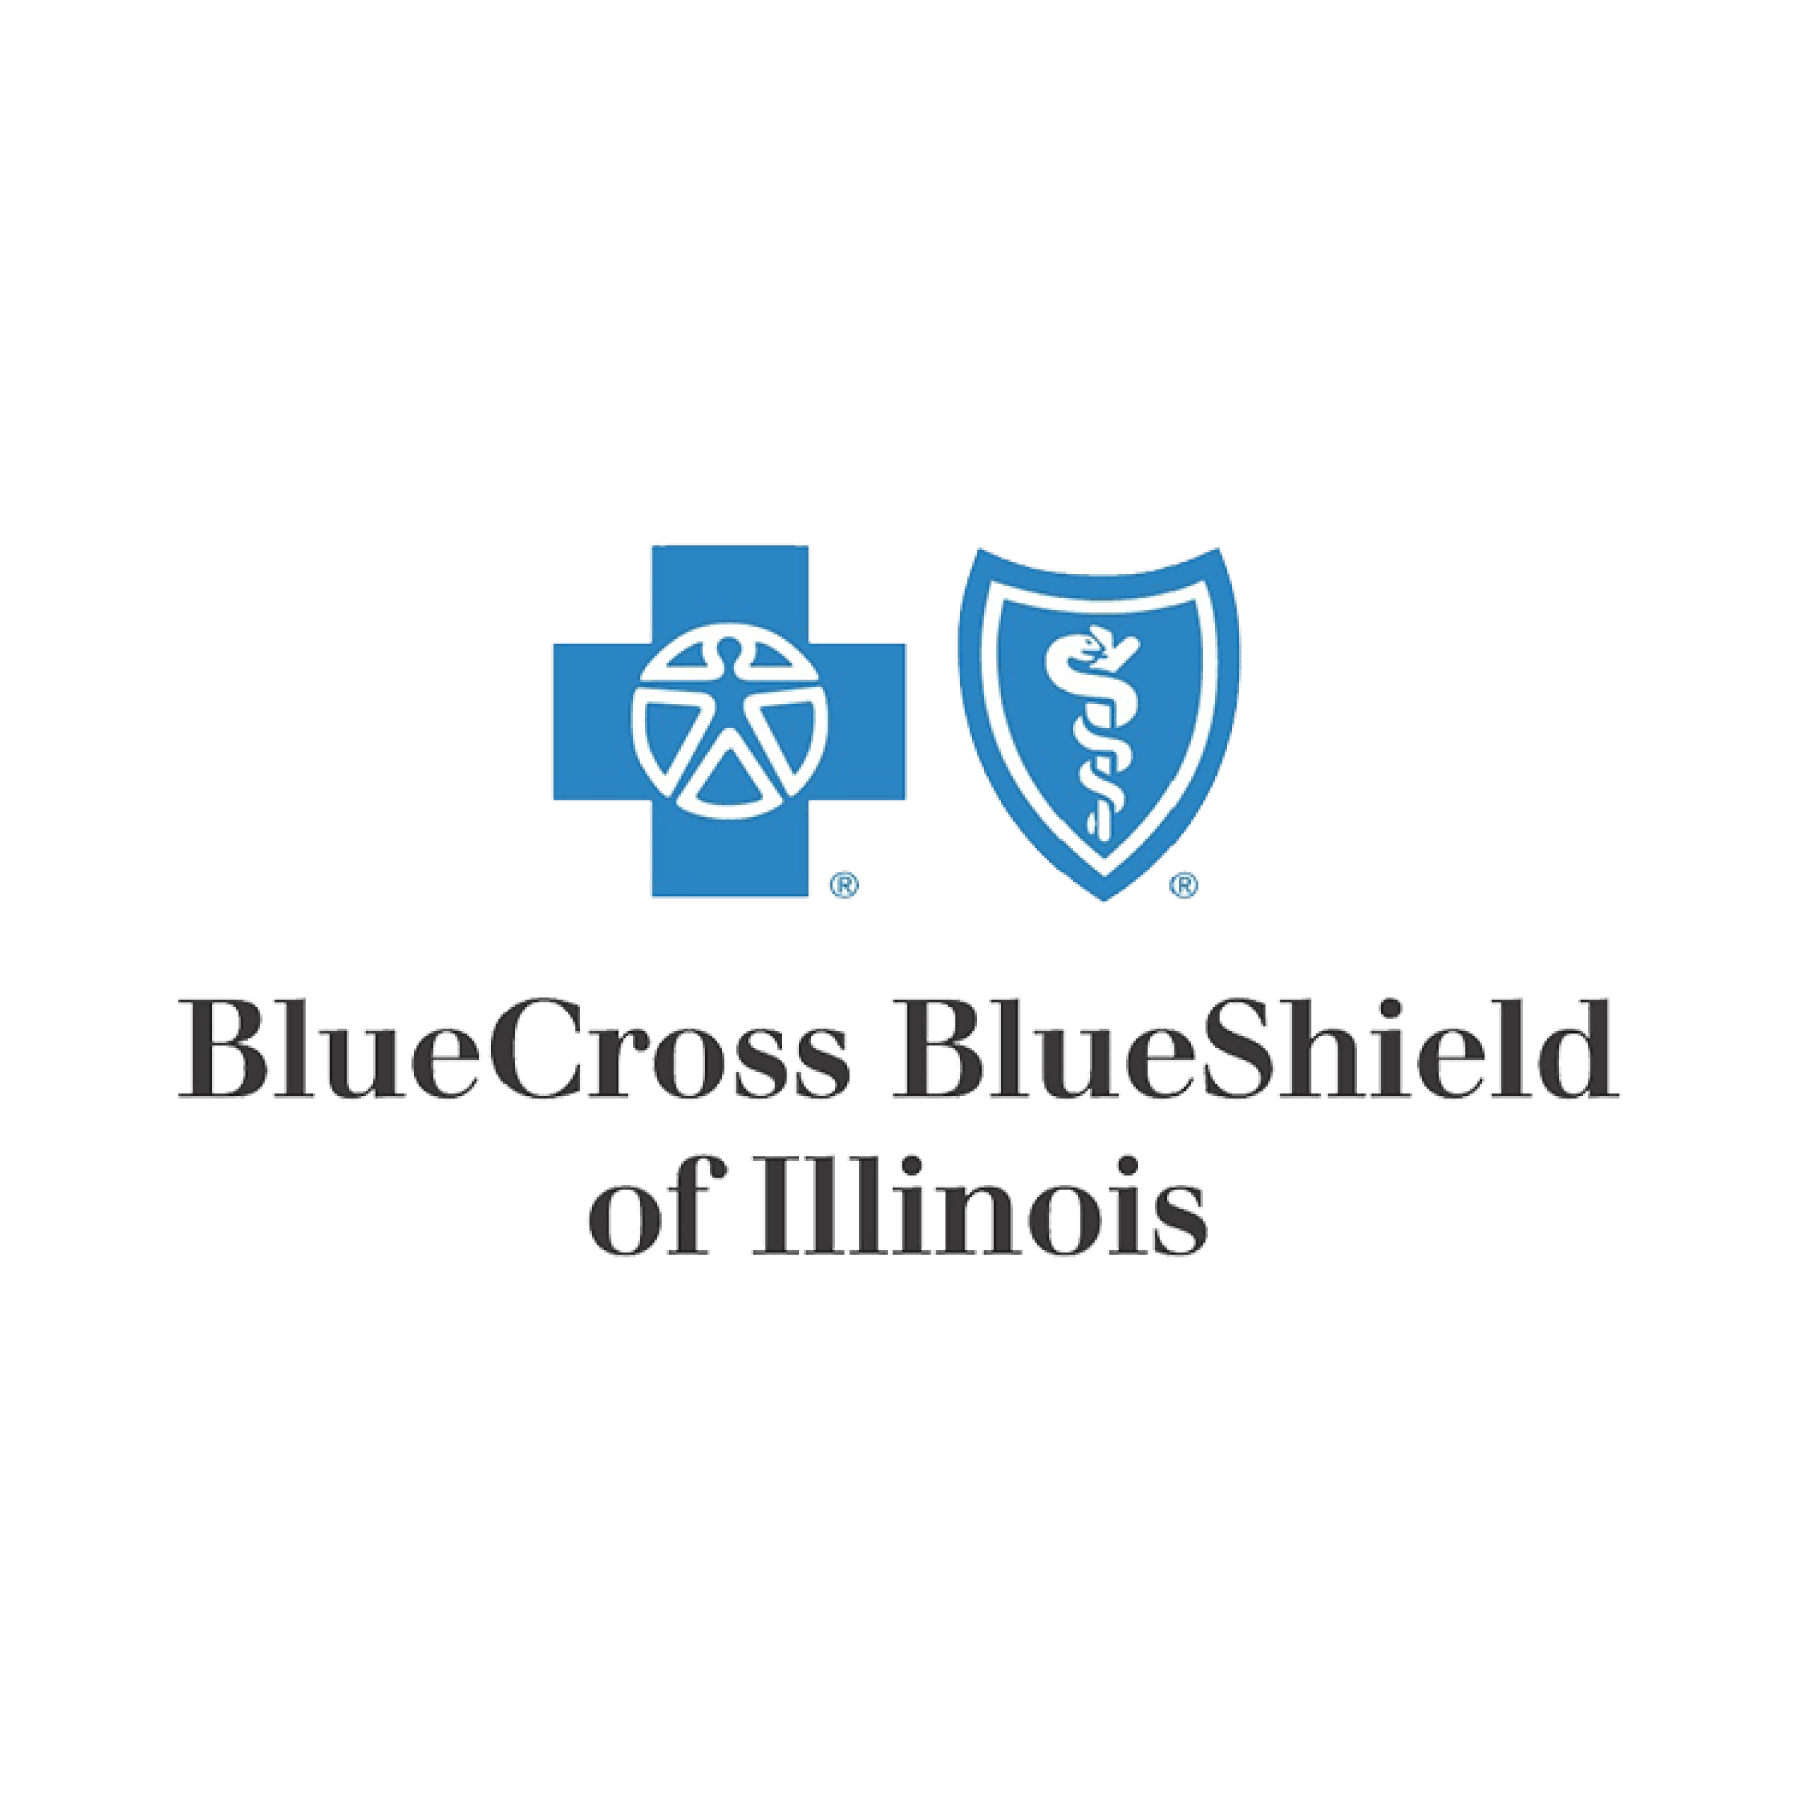 Blue Cross Blue Shield of Illinois